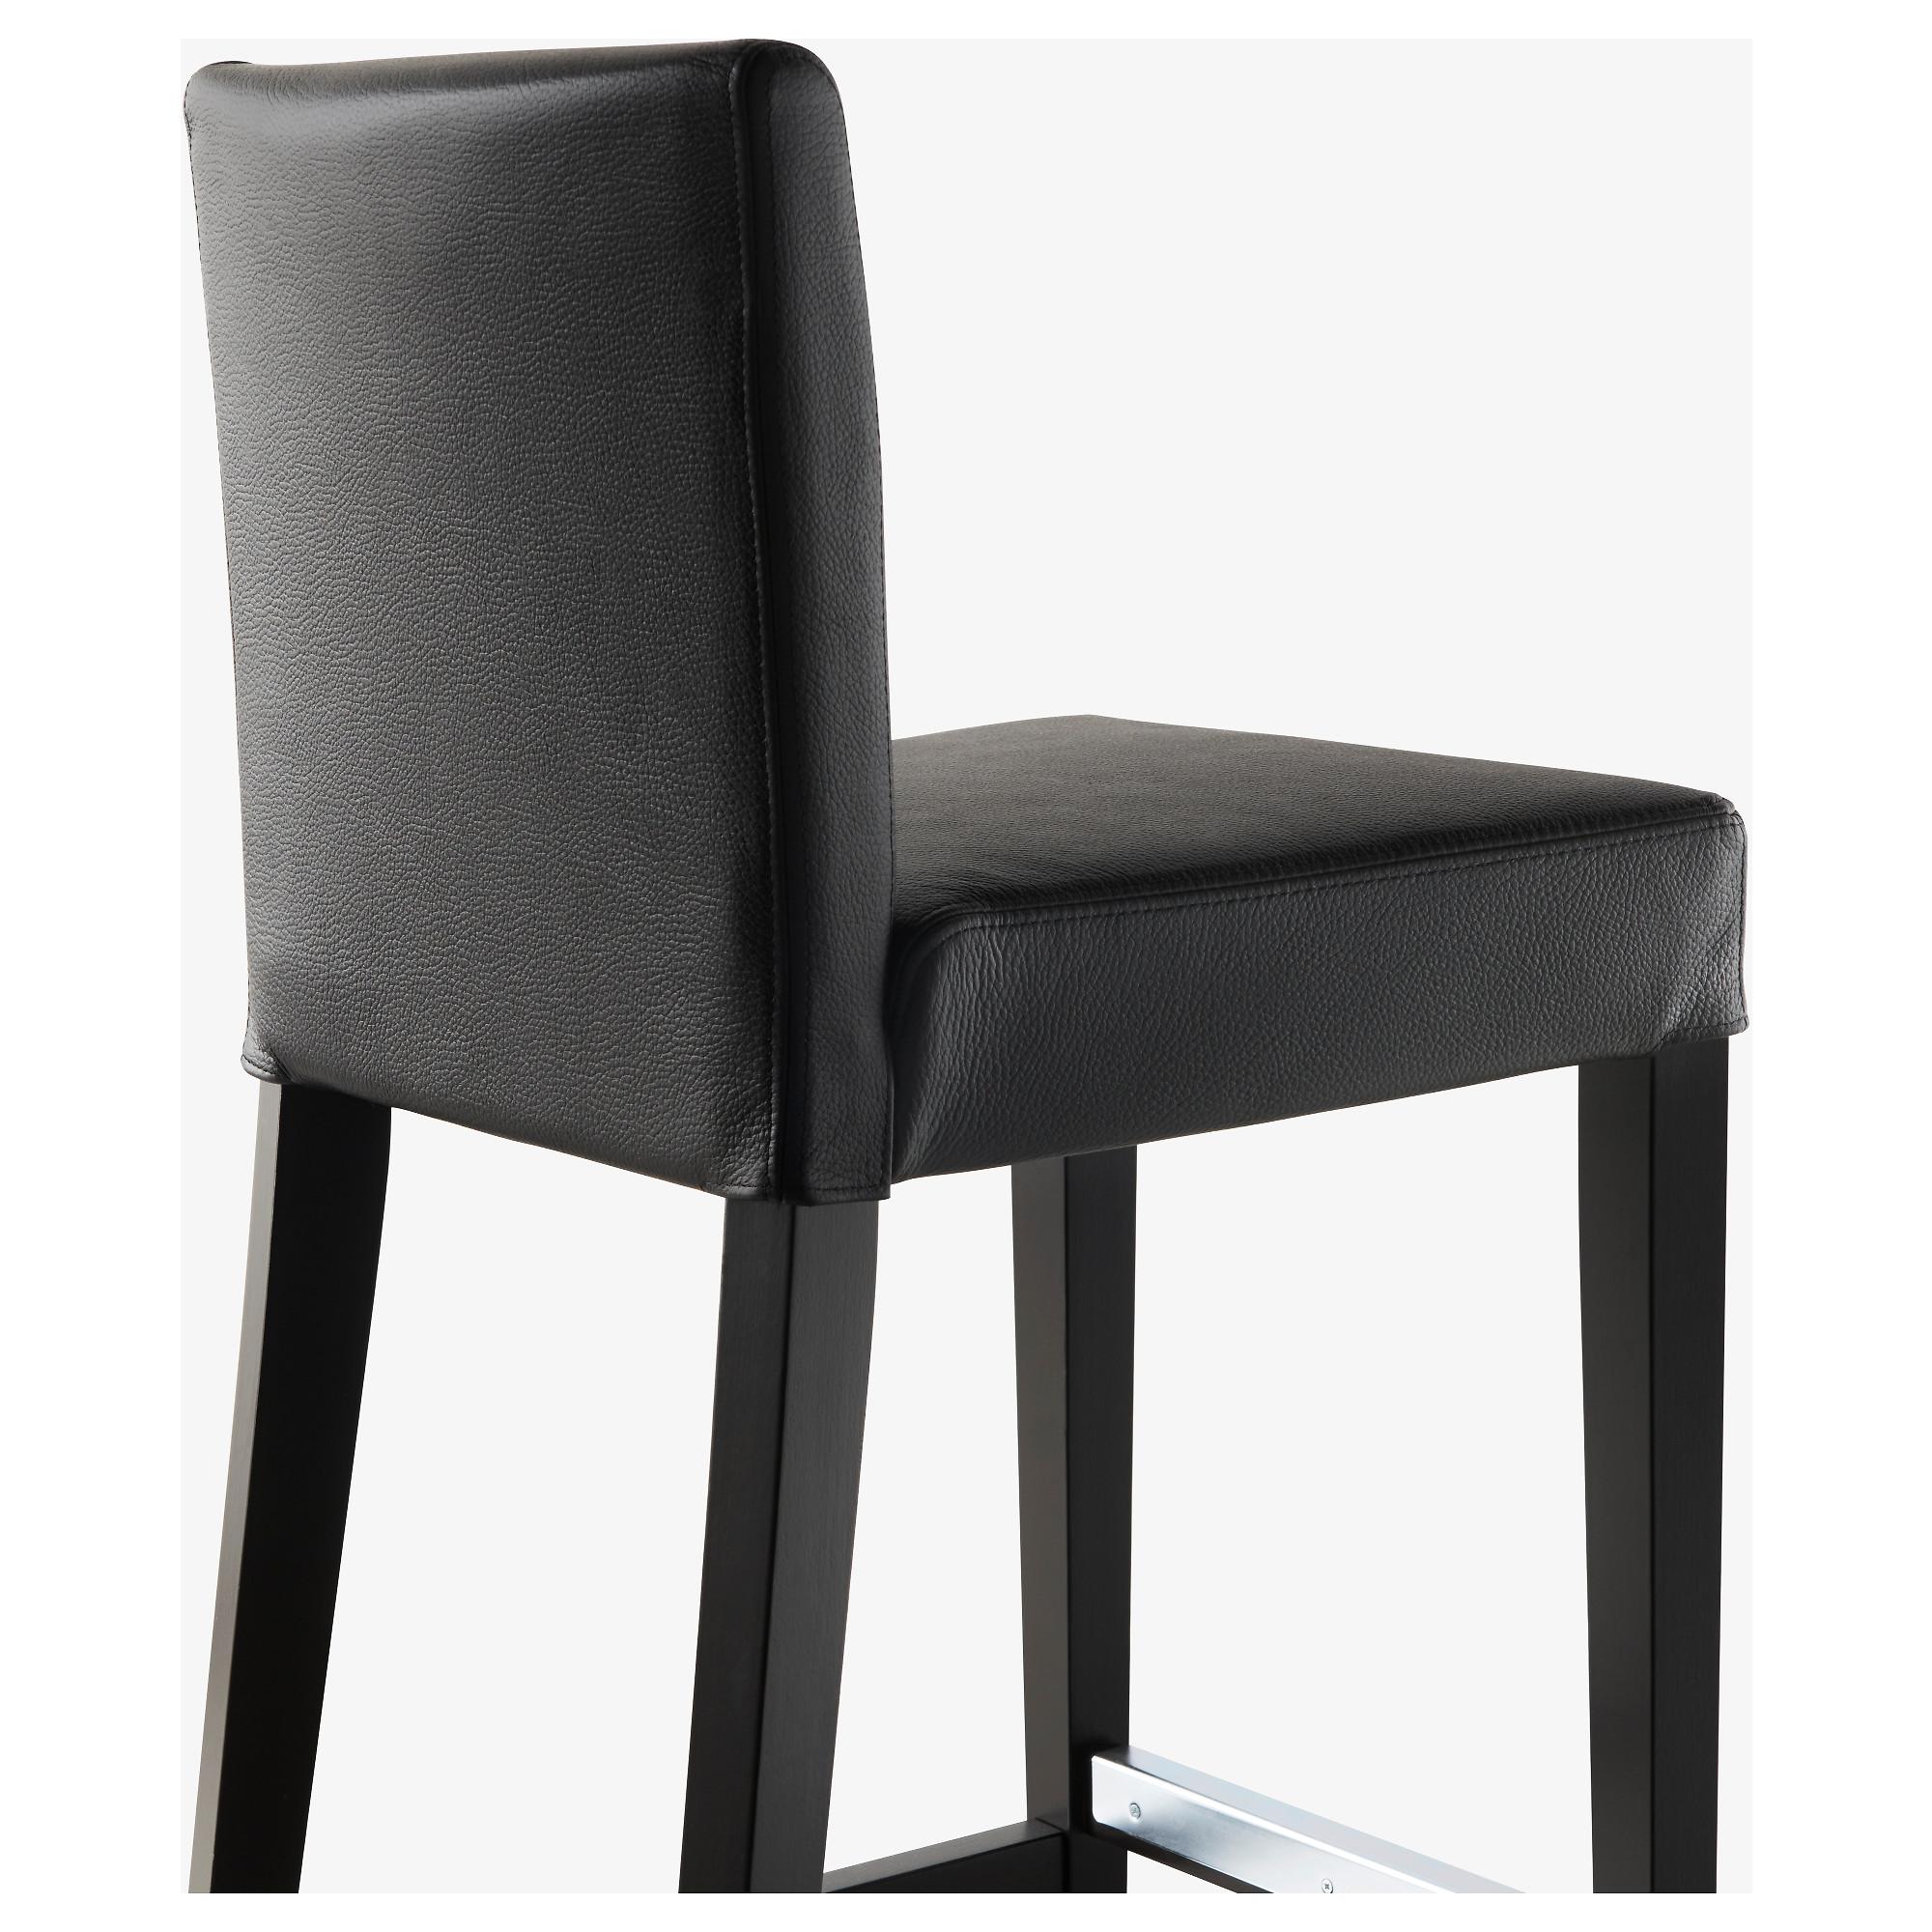 Incredible Henriksdal Bar Stool With Backrest Brown Black Glose Machost Co Dining Chair Design Ideas Machostcouk